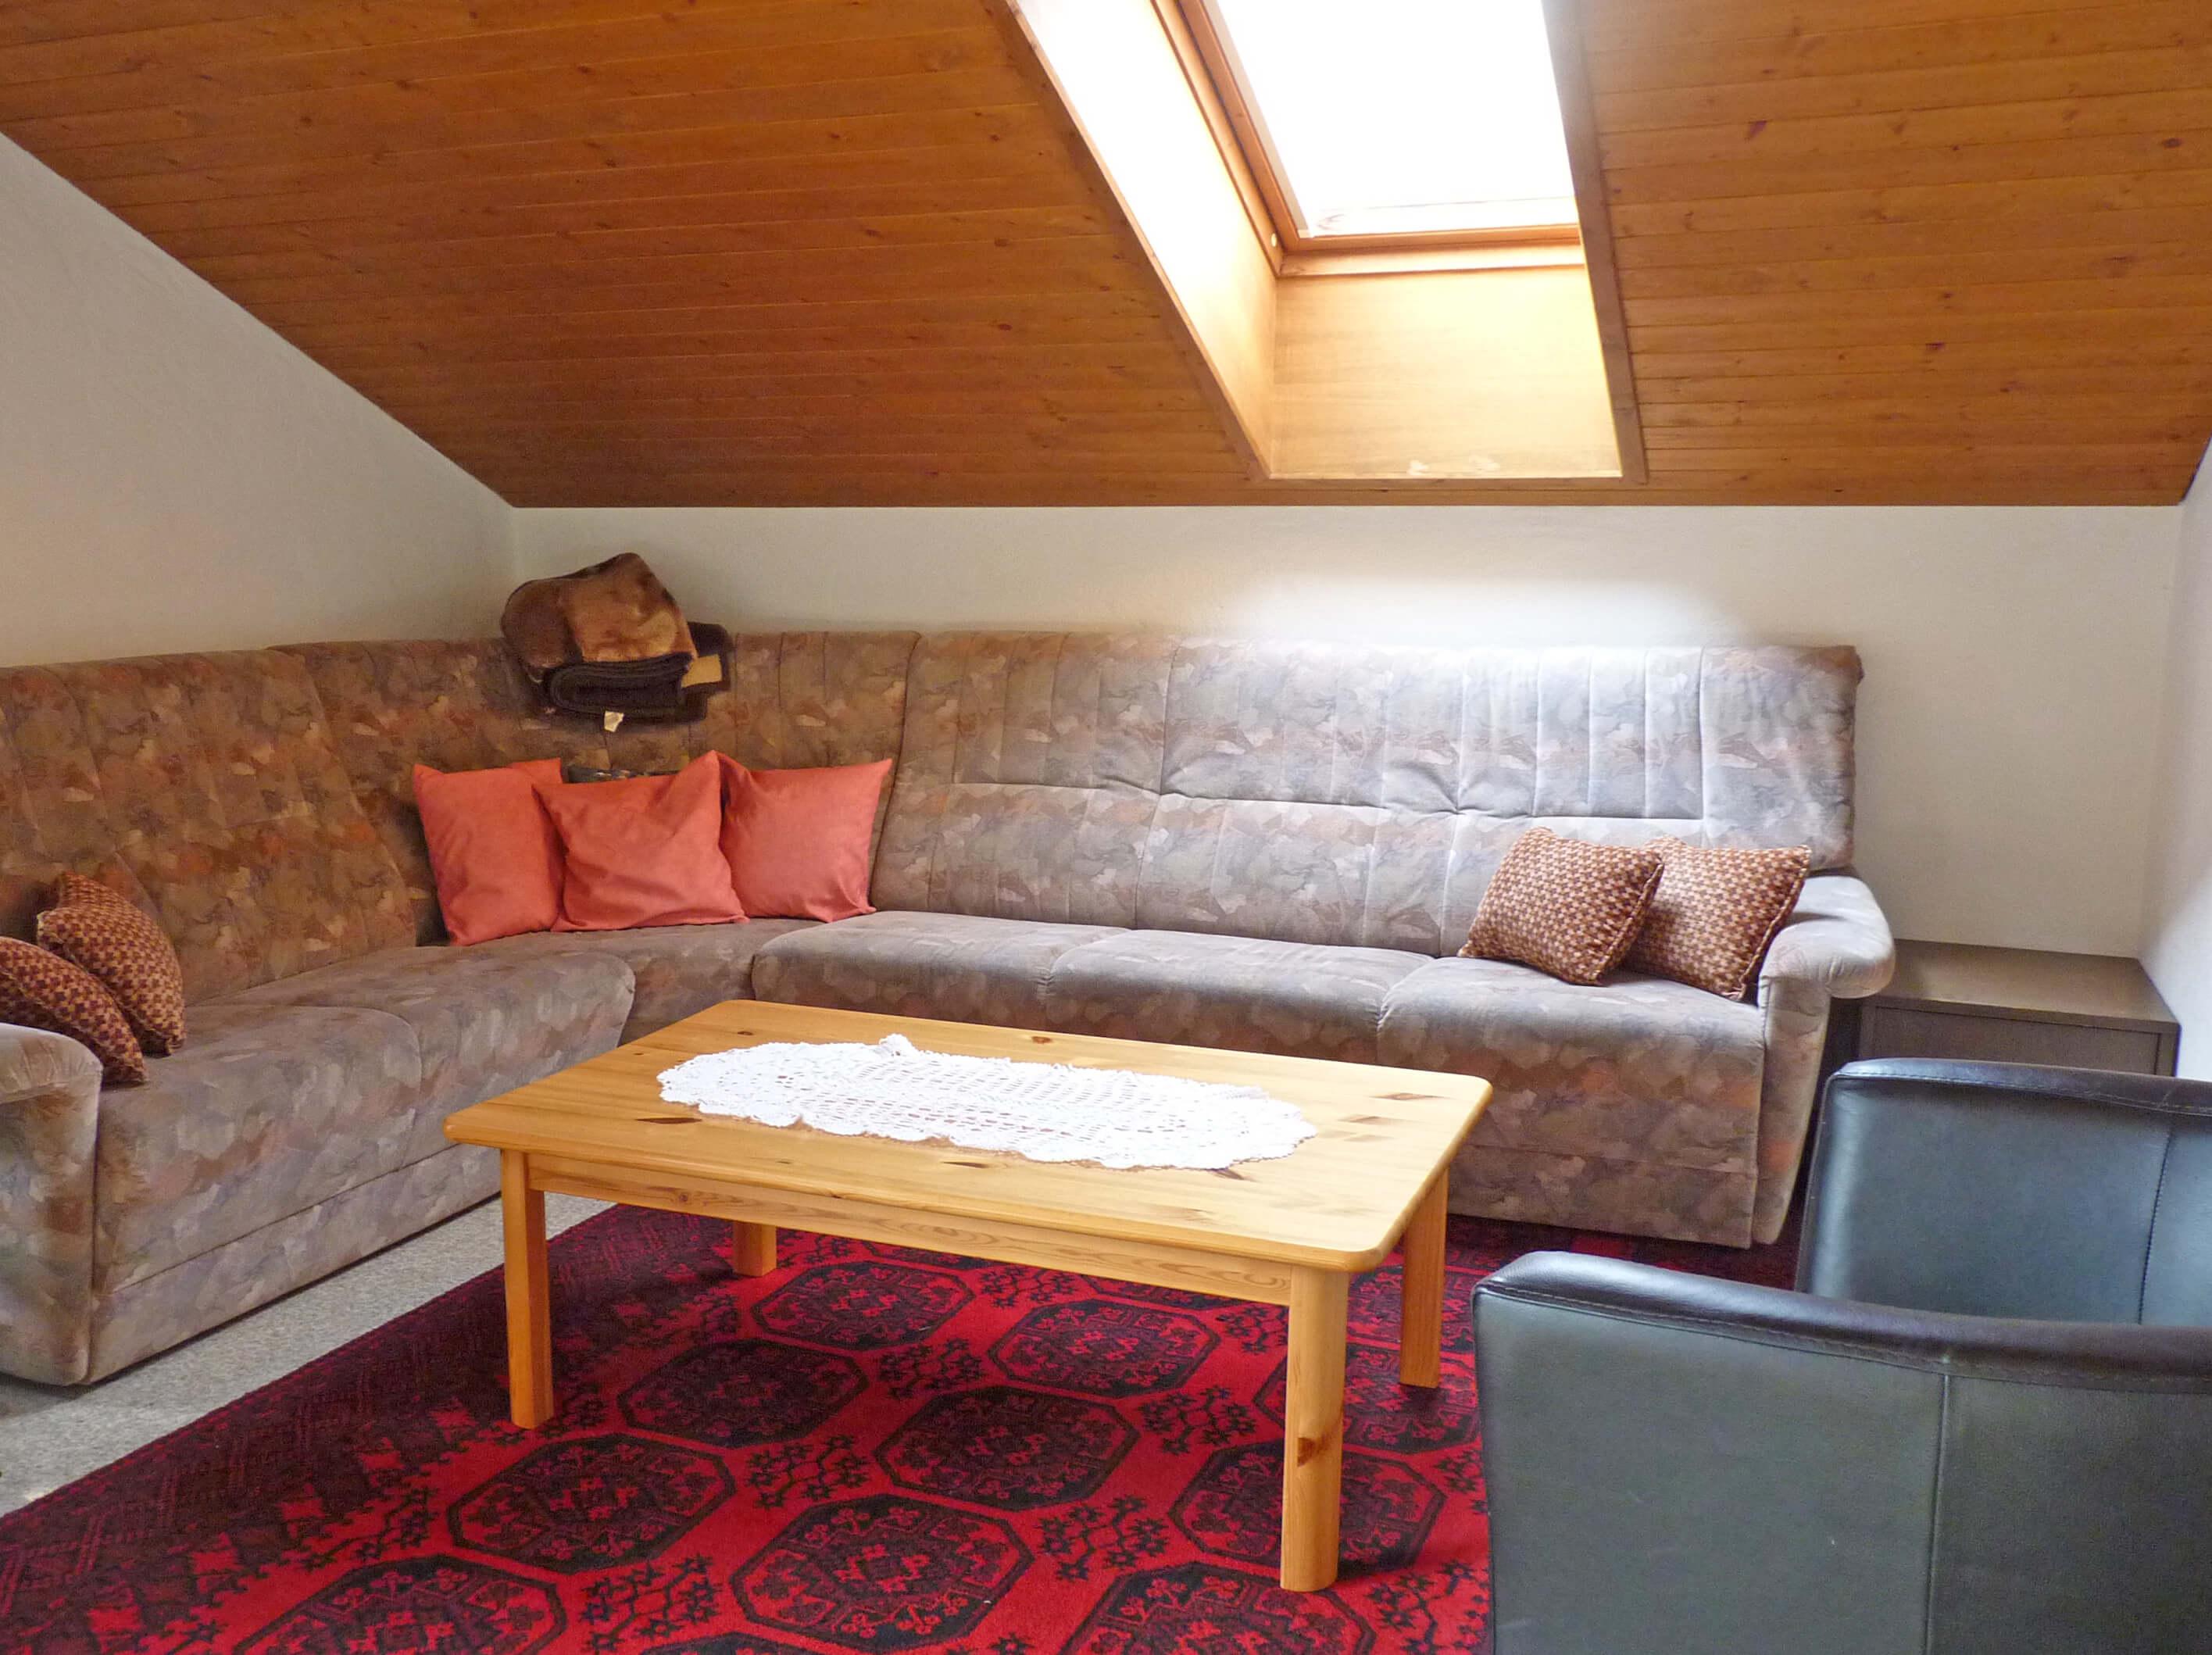 Barbara H21 Wohnzimmer Sofa